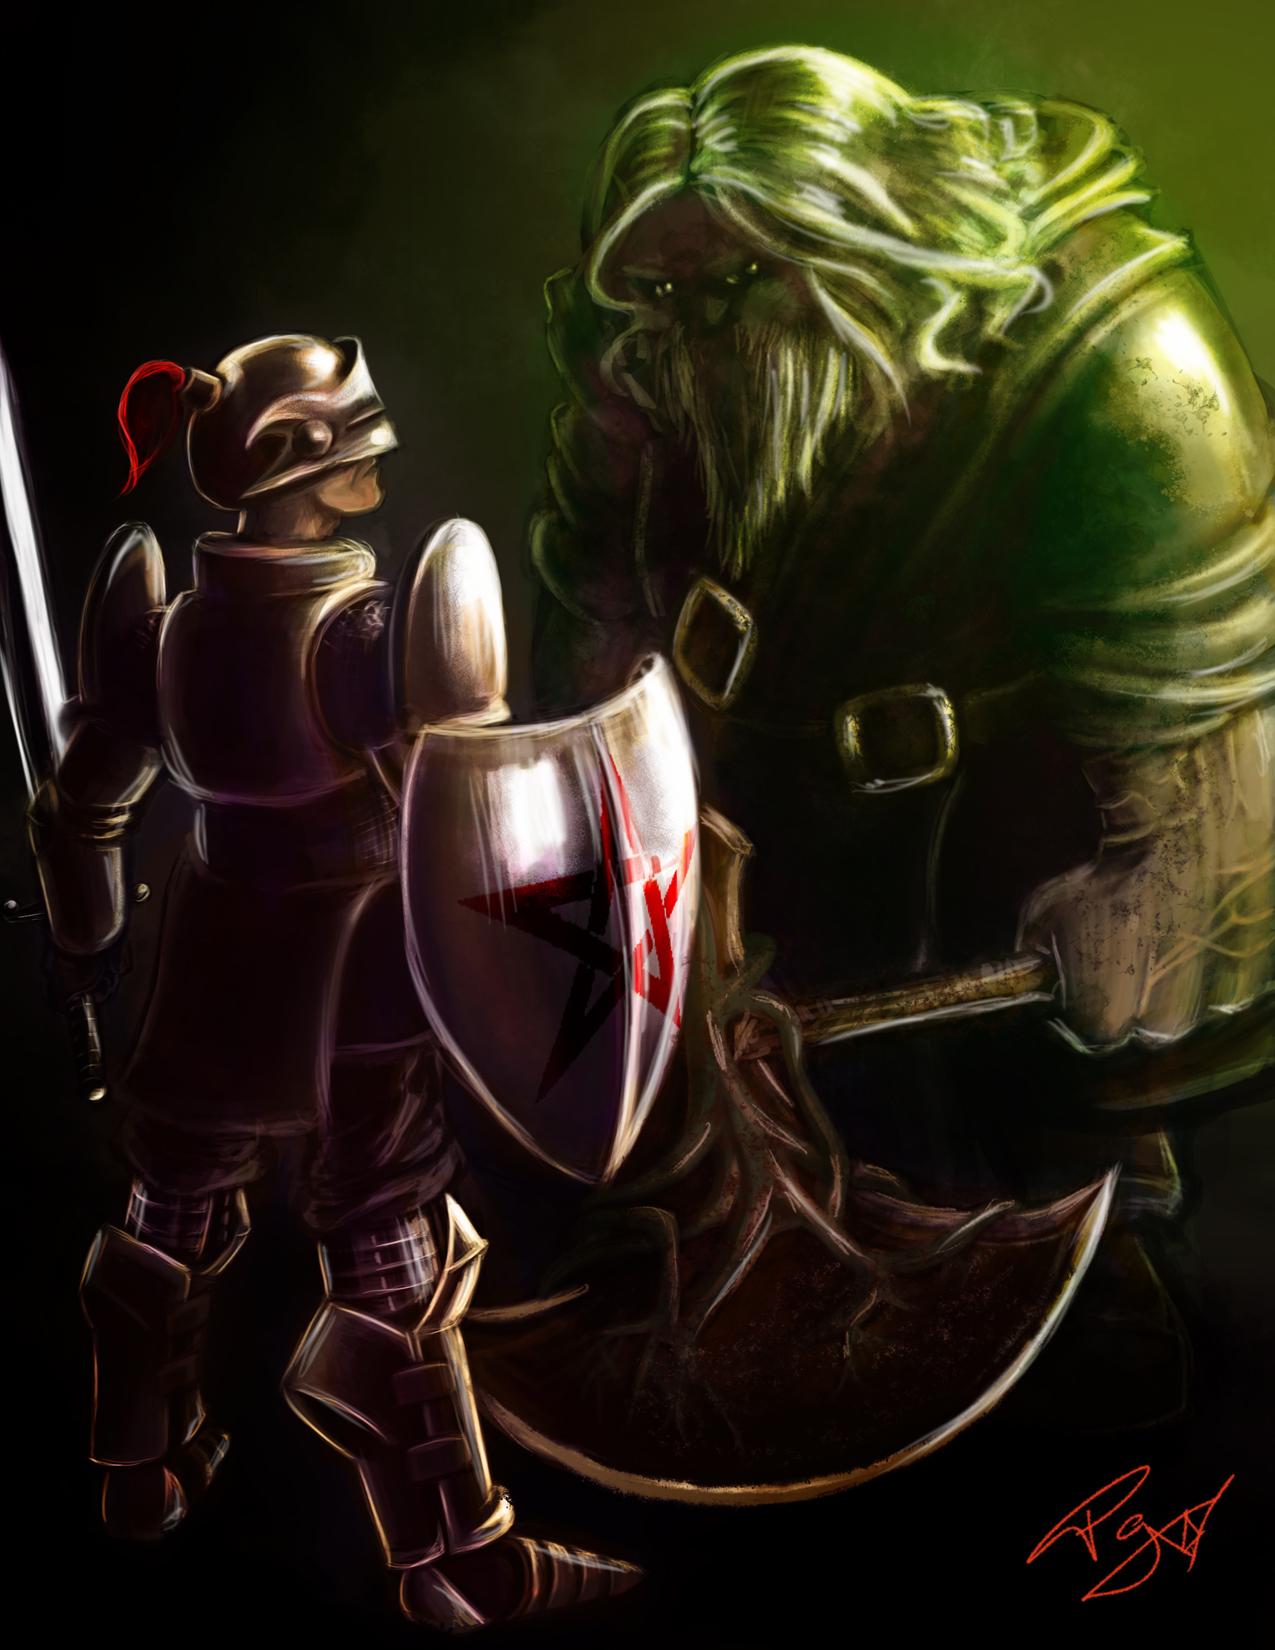 Gawain & The Green Knight